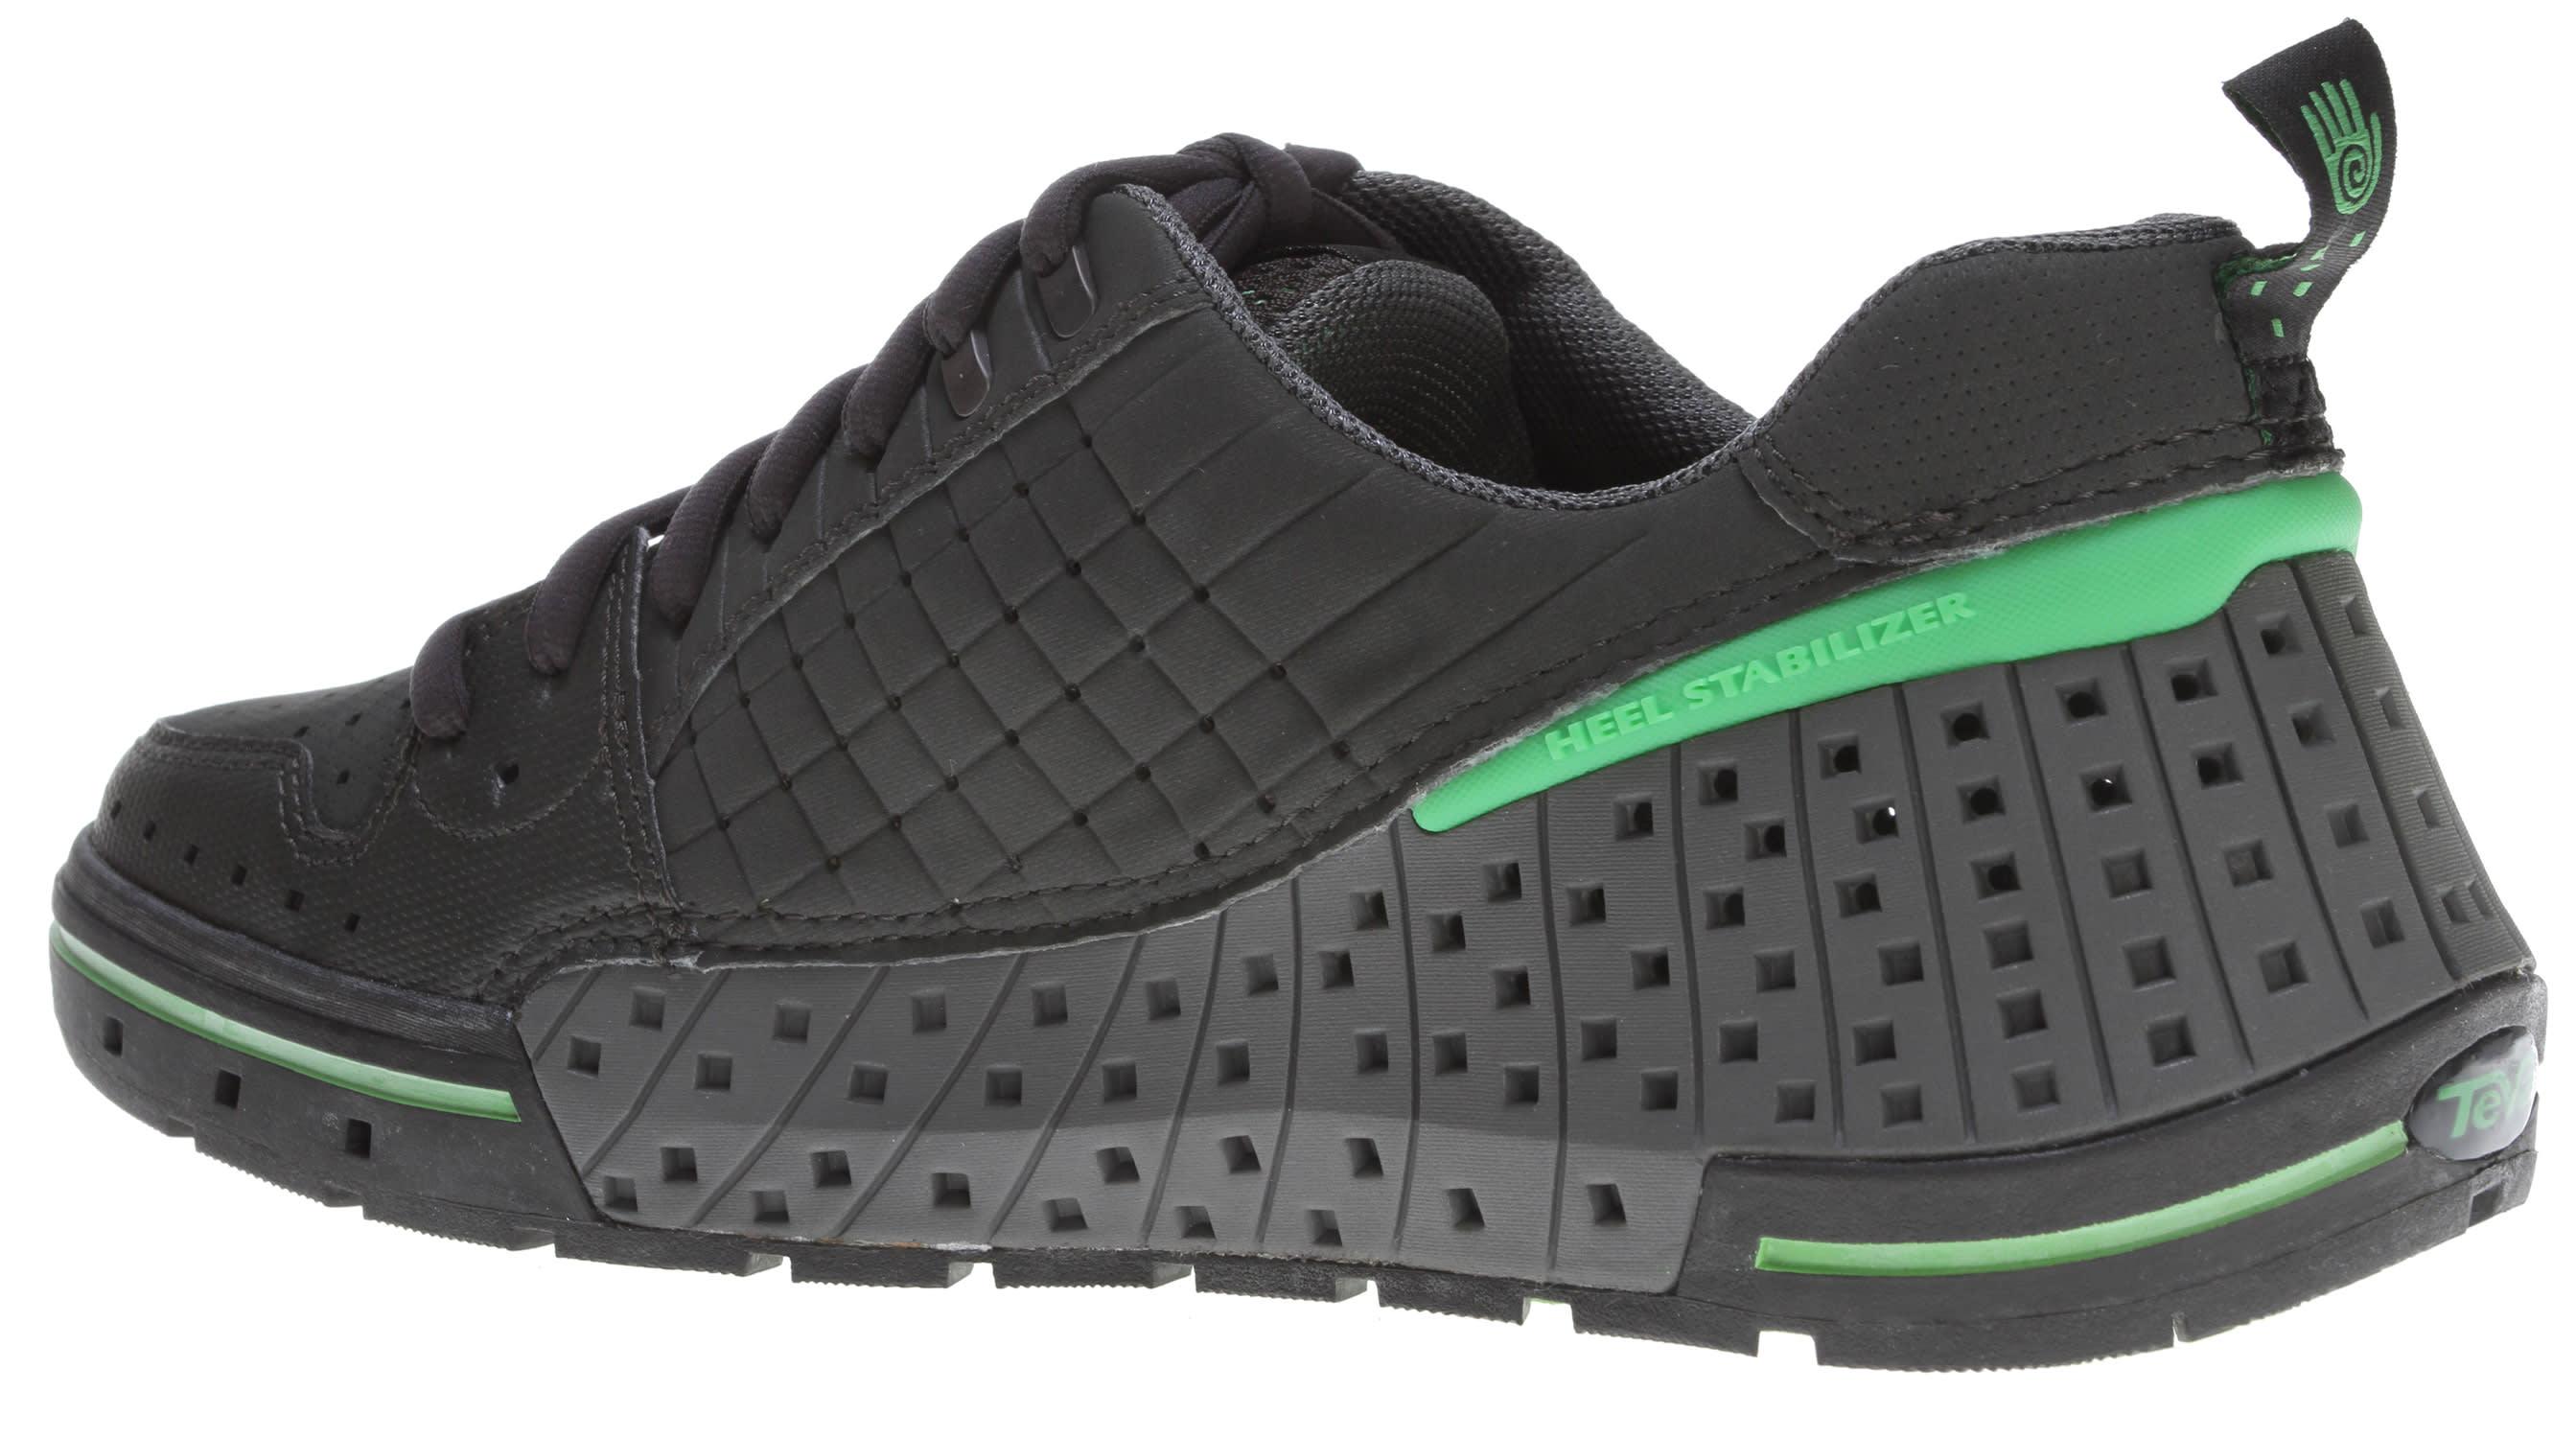 0b0bd54bbfd23 Teva Gnarkosi Wakeskate Shoes - thumbnail 3